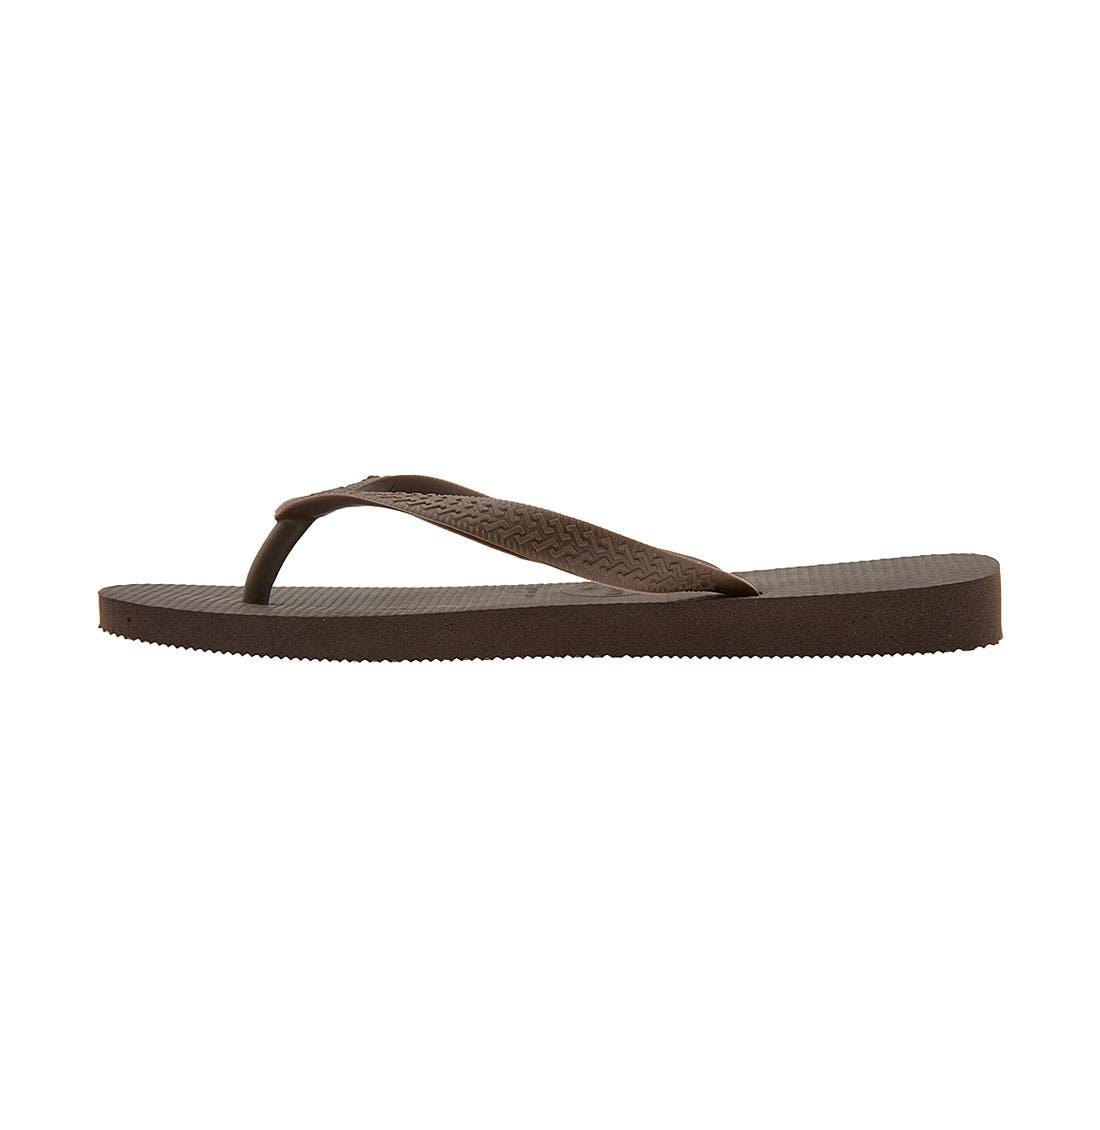 Alternate Image 2  - Havaianas 'Top' Sandal (Women)